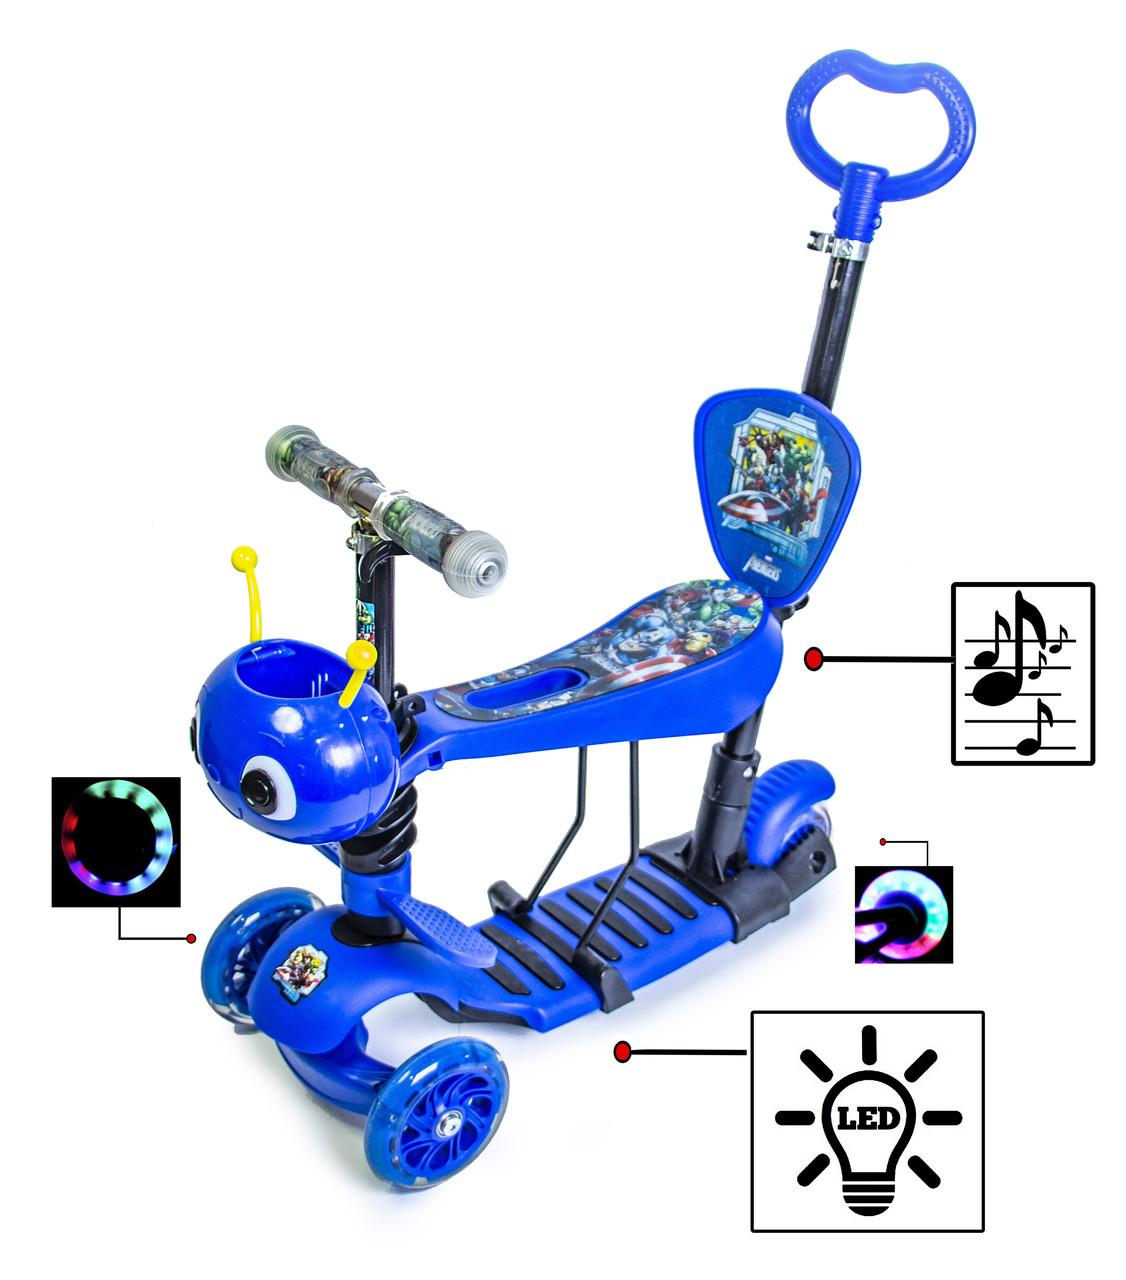 "Самокат Scooter ""Пчелка"" 5in1. Герои. Blue. со светом и музыкой!"